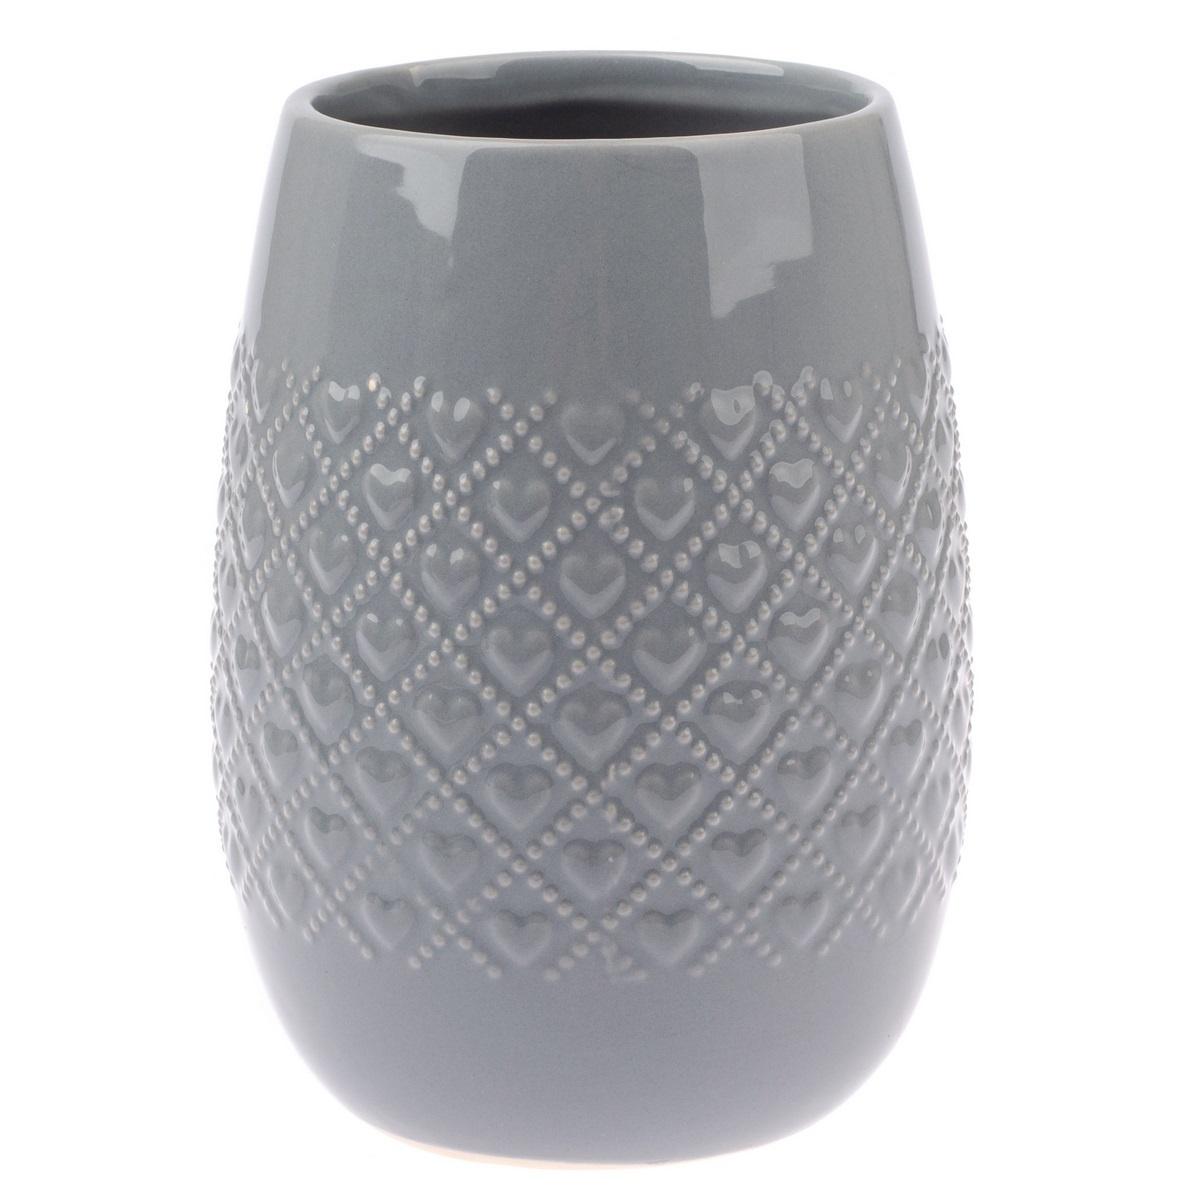 Keramický obal na květináč Fains šedá, 18 cm